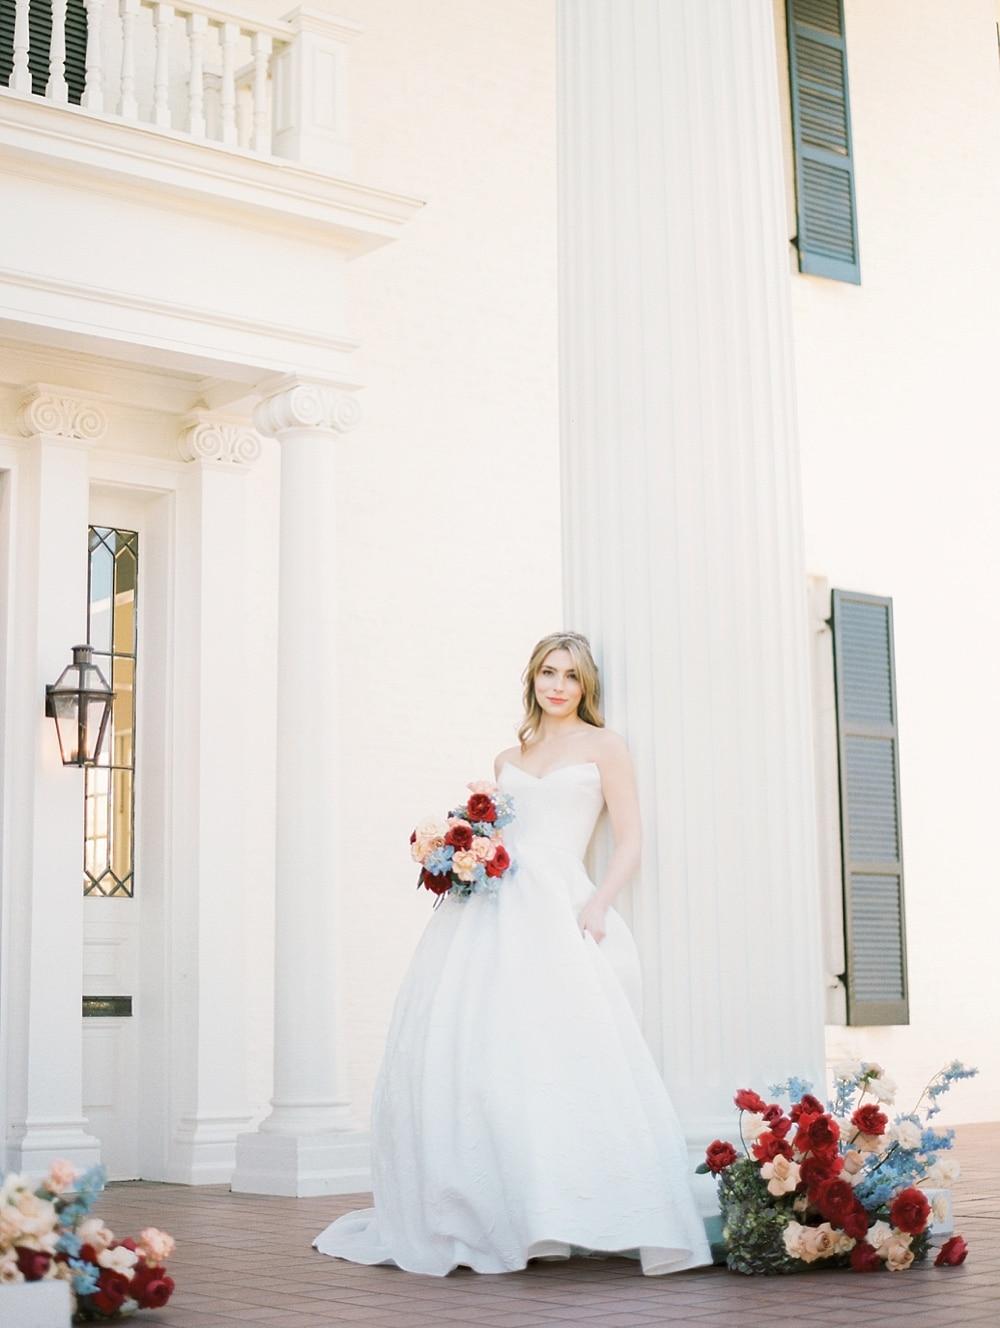 kristin-la-voie-photography-austin-wedding-photographer-woodbine-mansion-153